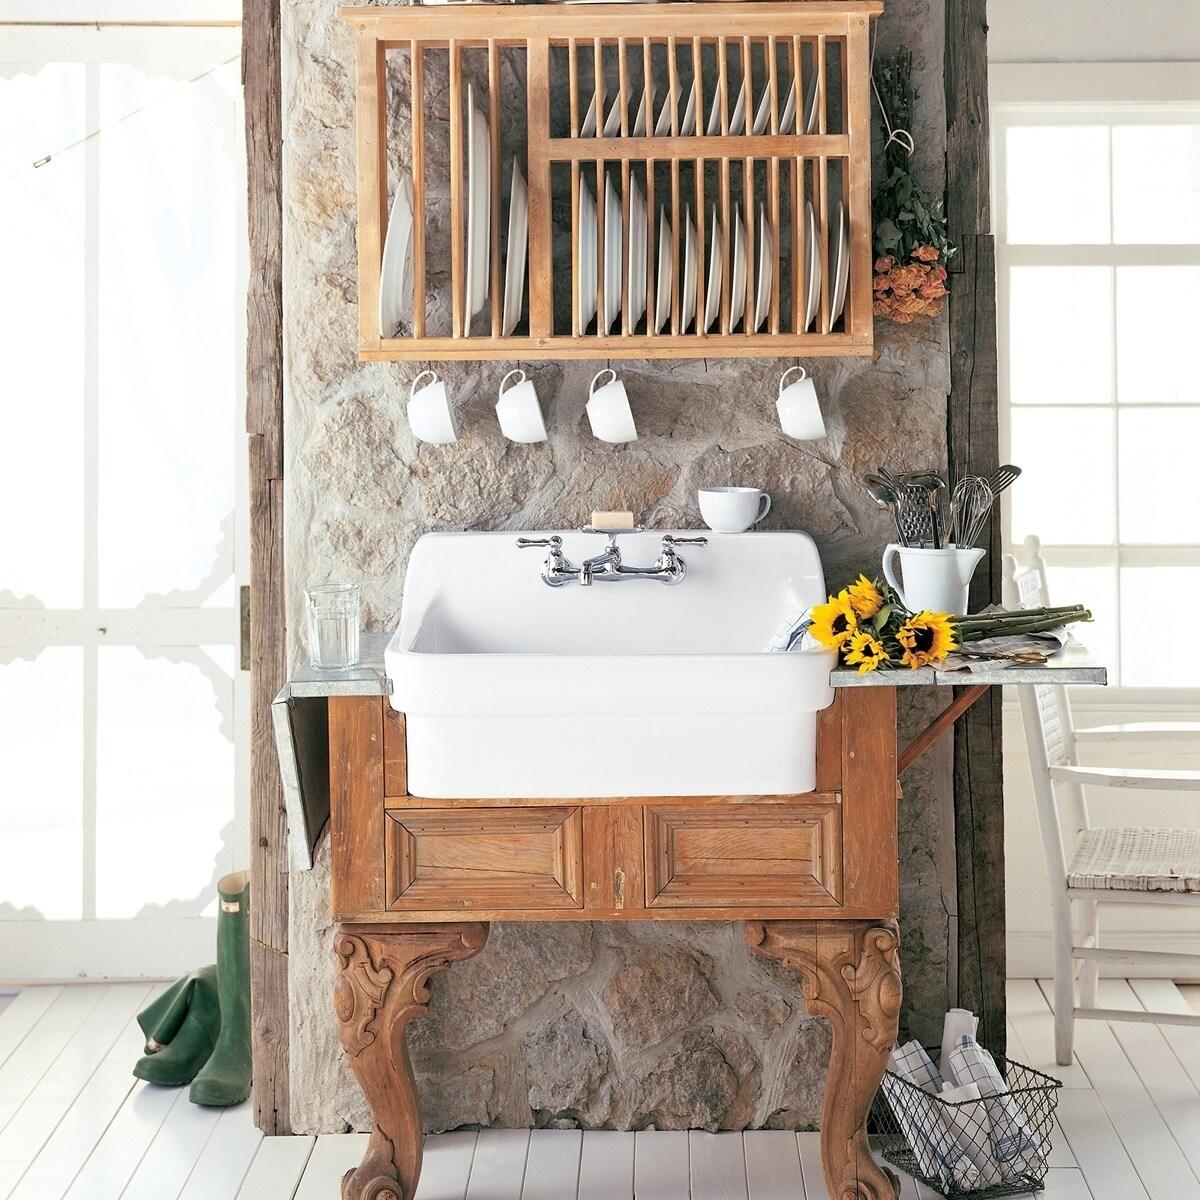 Shop American Standard Country Kitchen Sink 9062.008.020 White ...